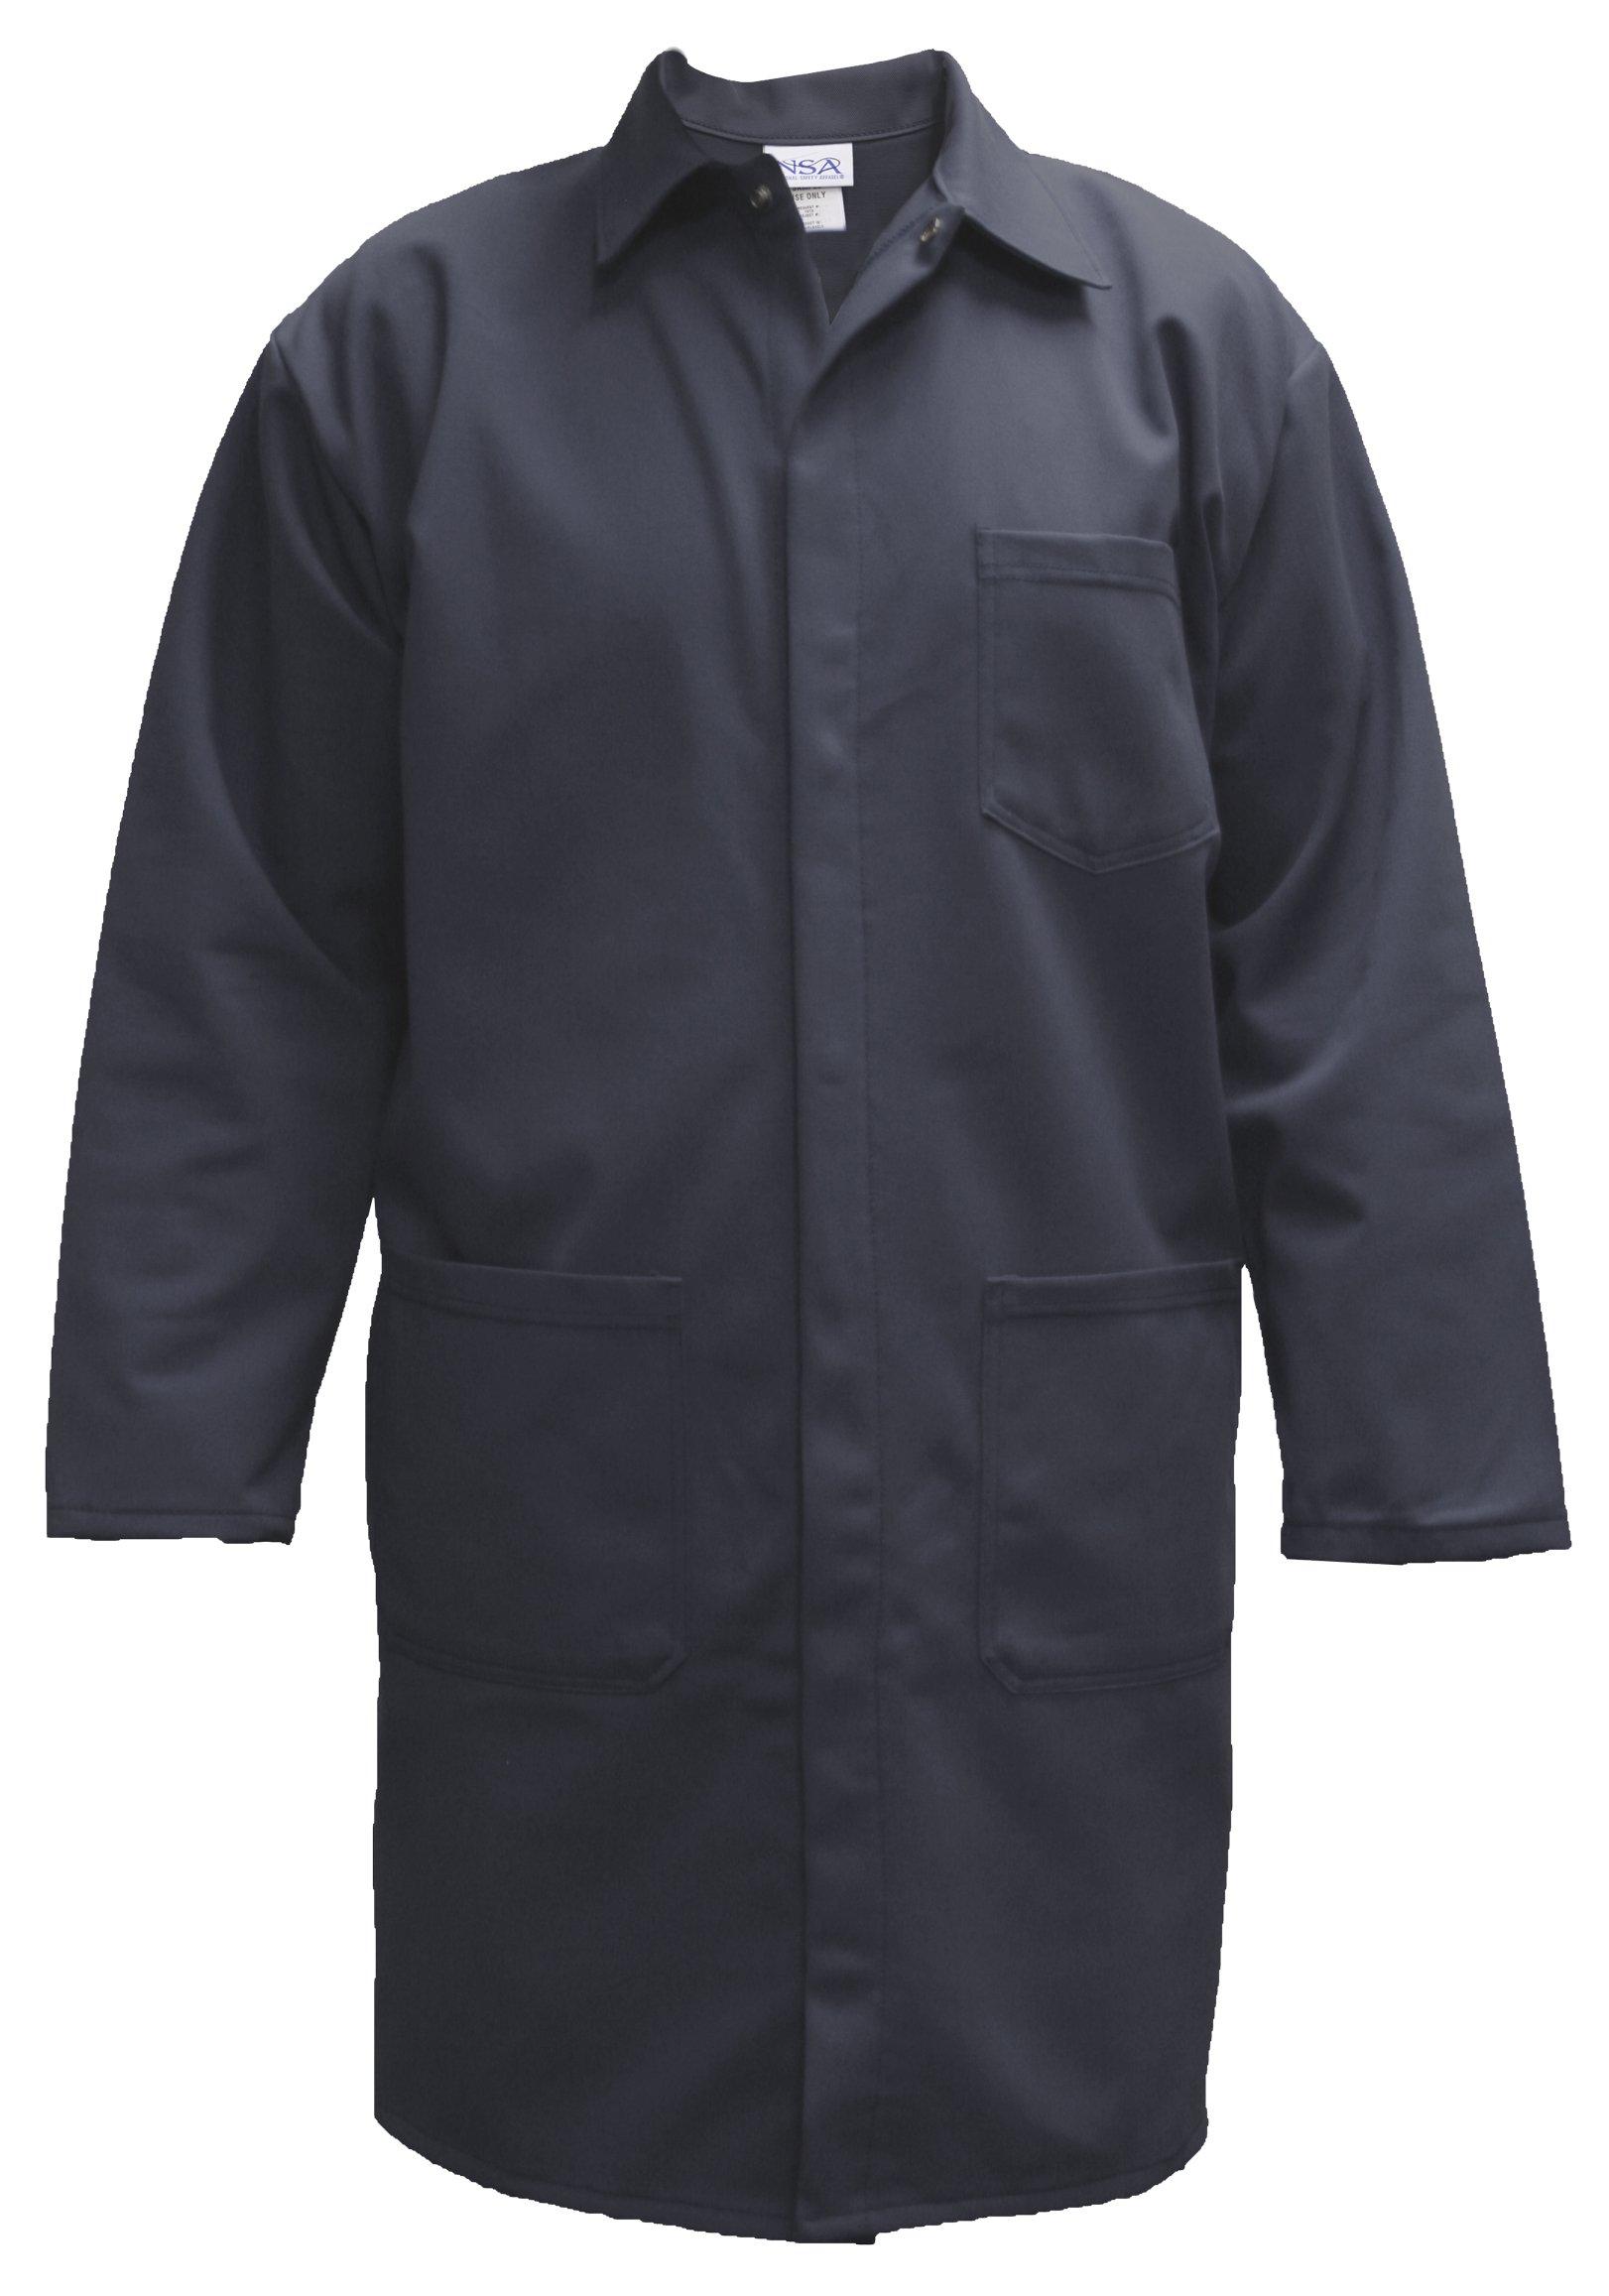 National Safety Apparel C09UPLCLG42 UltraSoft Lab Coat, 88% Cotton, 12% Nylon FR, Large, Navy